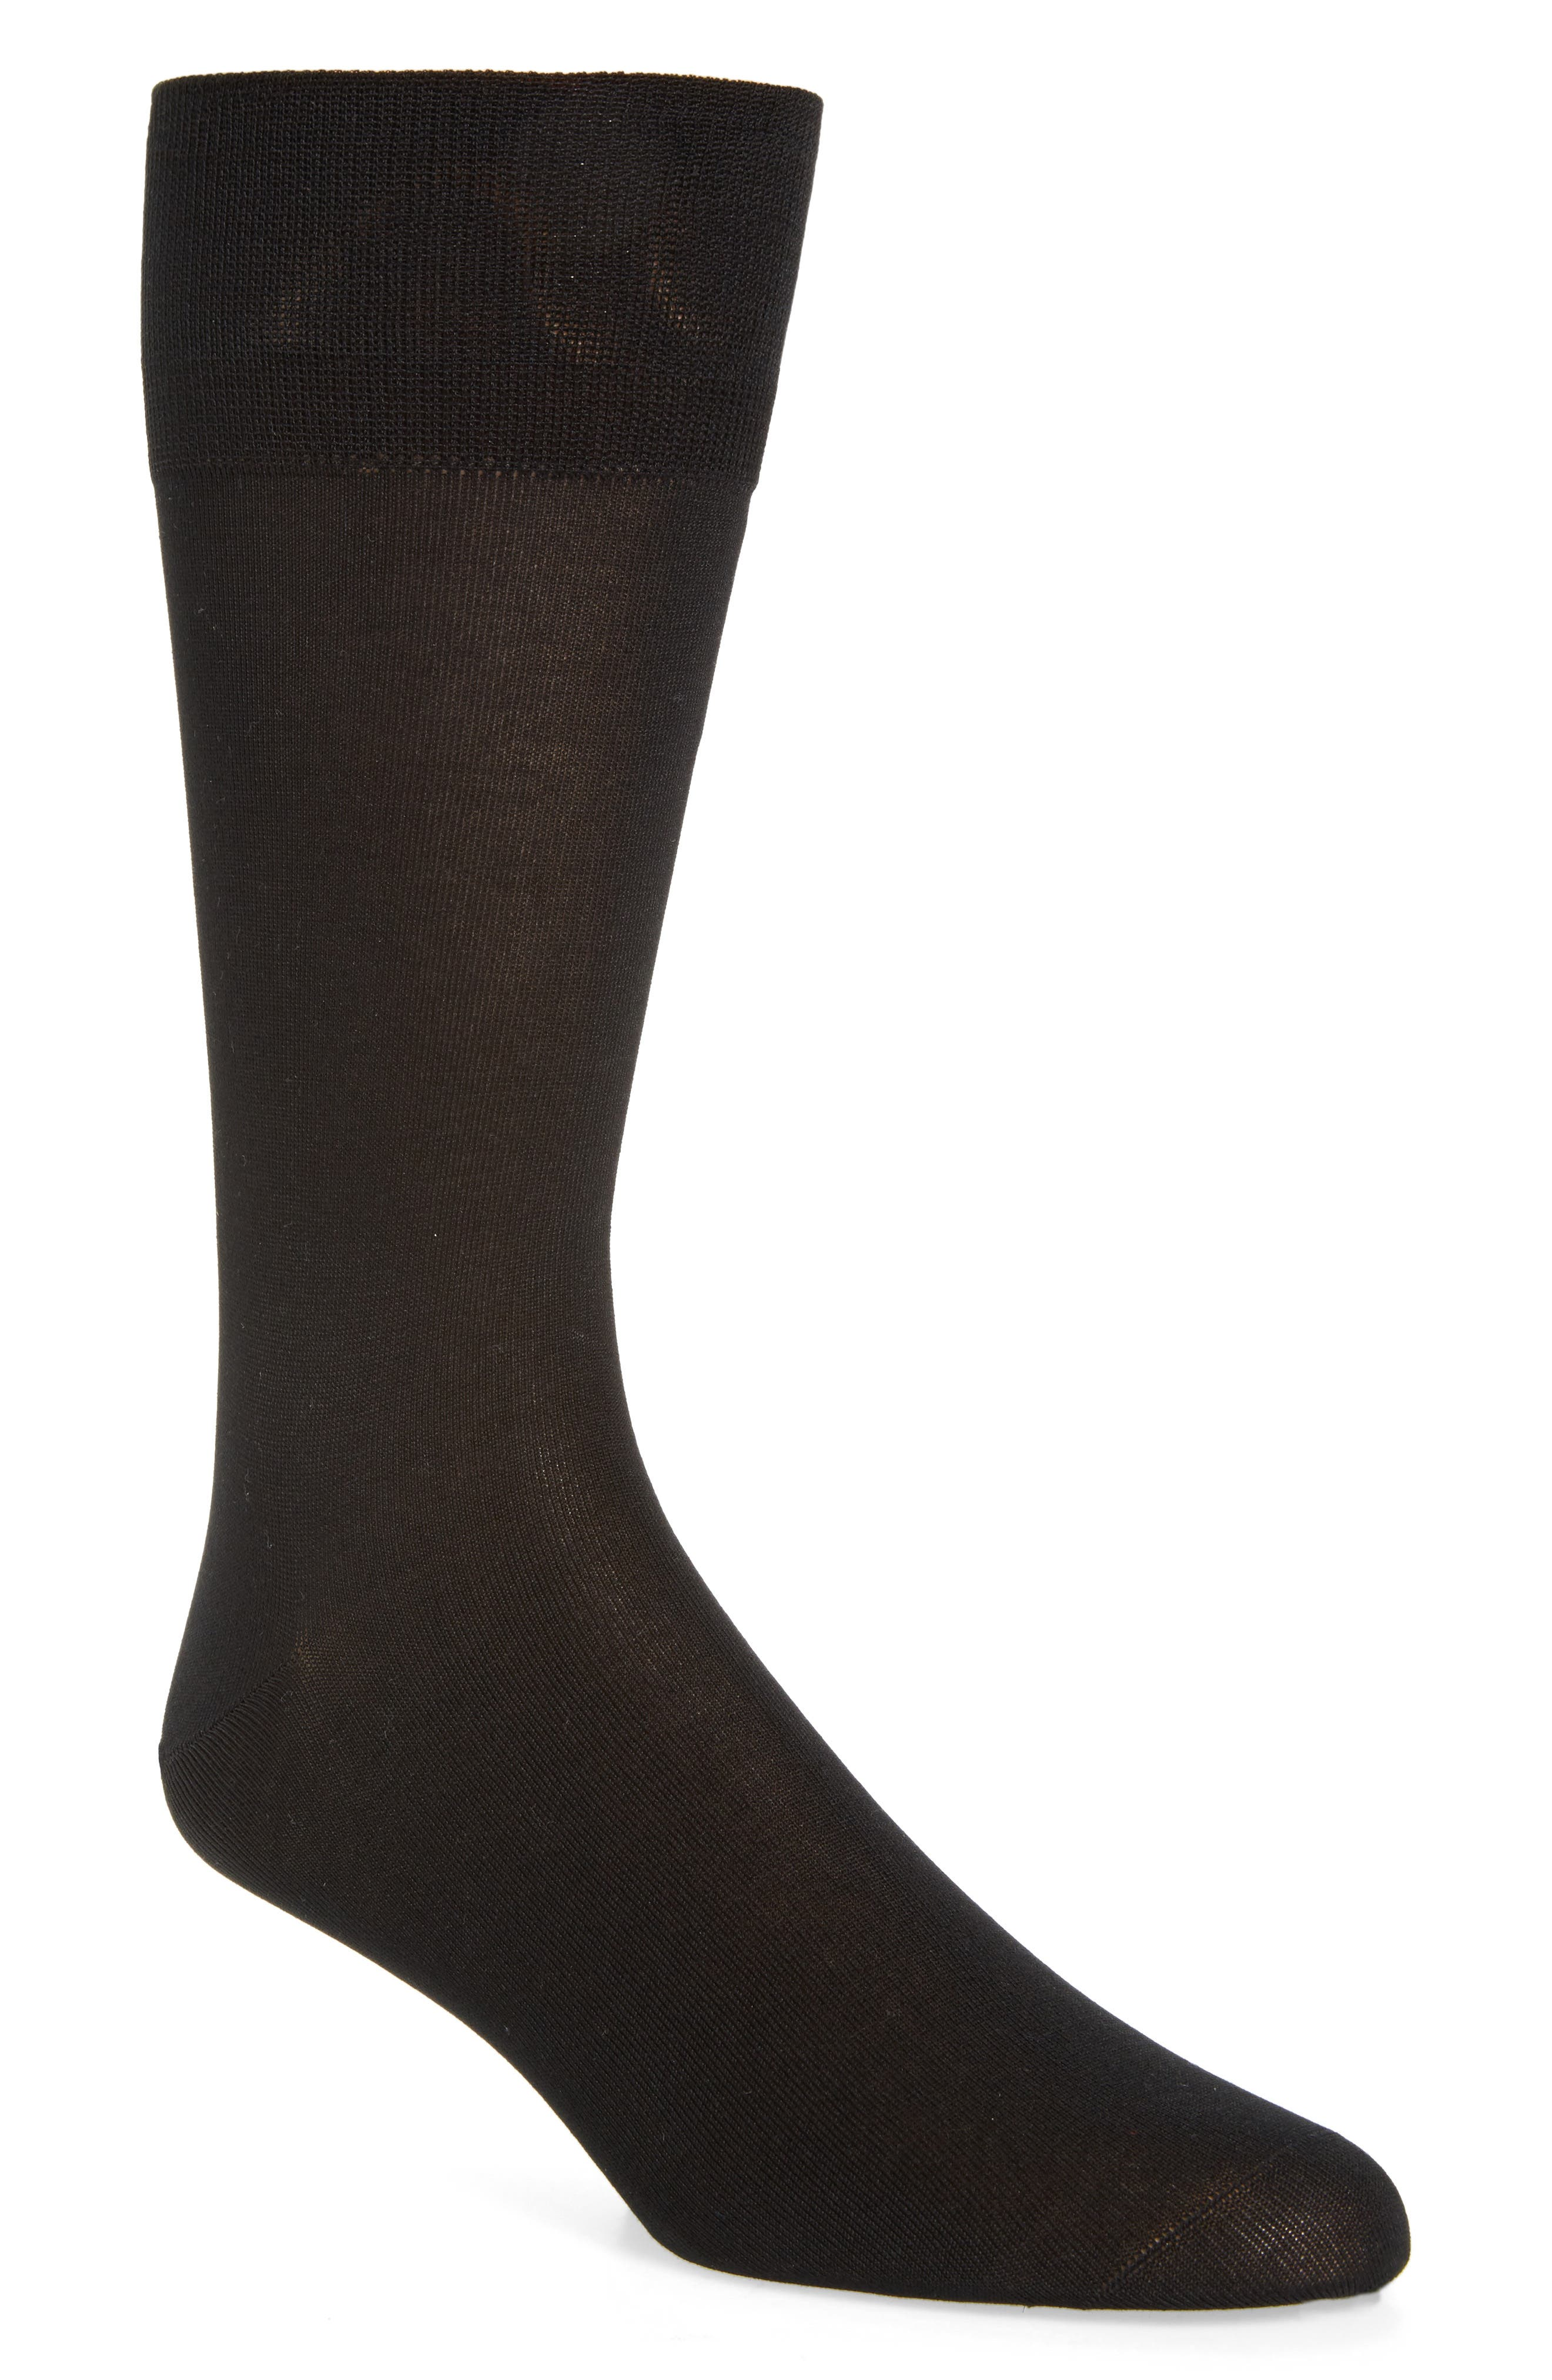 Main Image - John W. Nordstrom® Socks